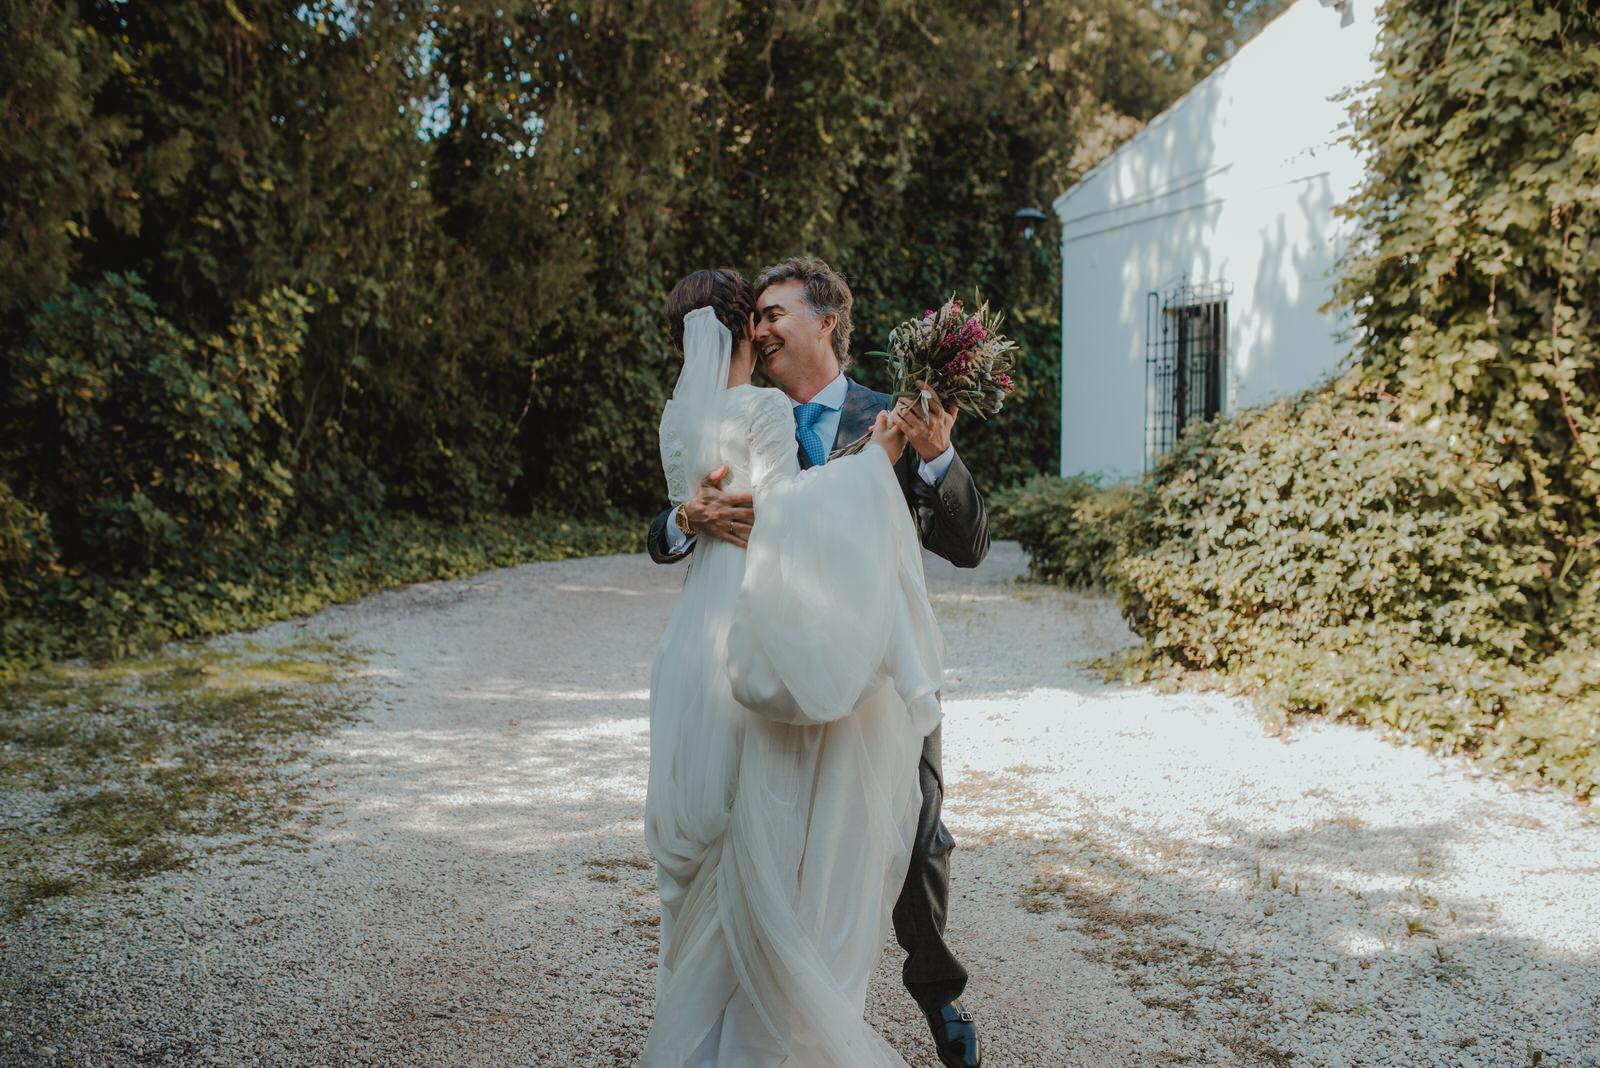 Fotografo de boda en Malaga | Boda en la Casilla de Maera